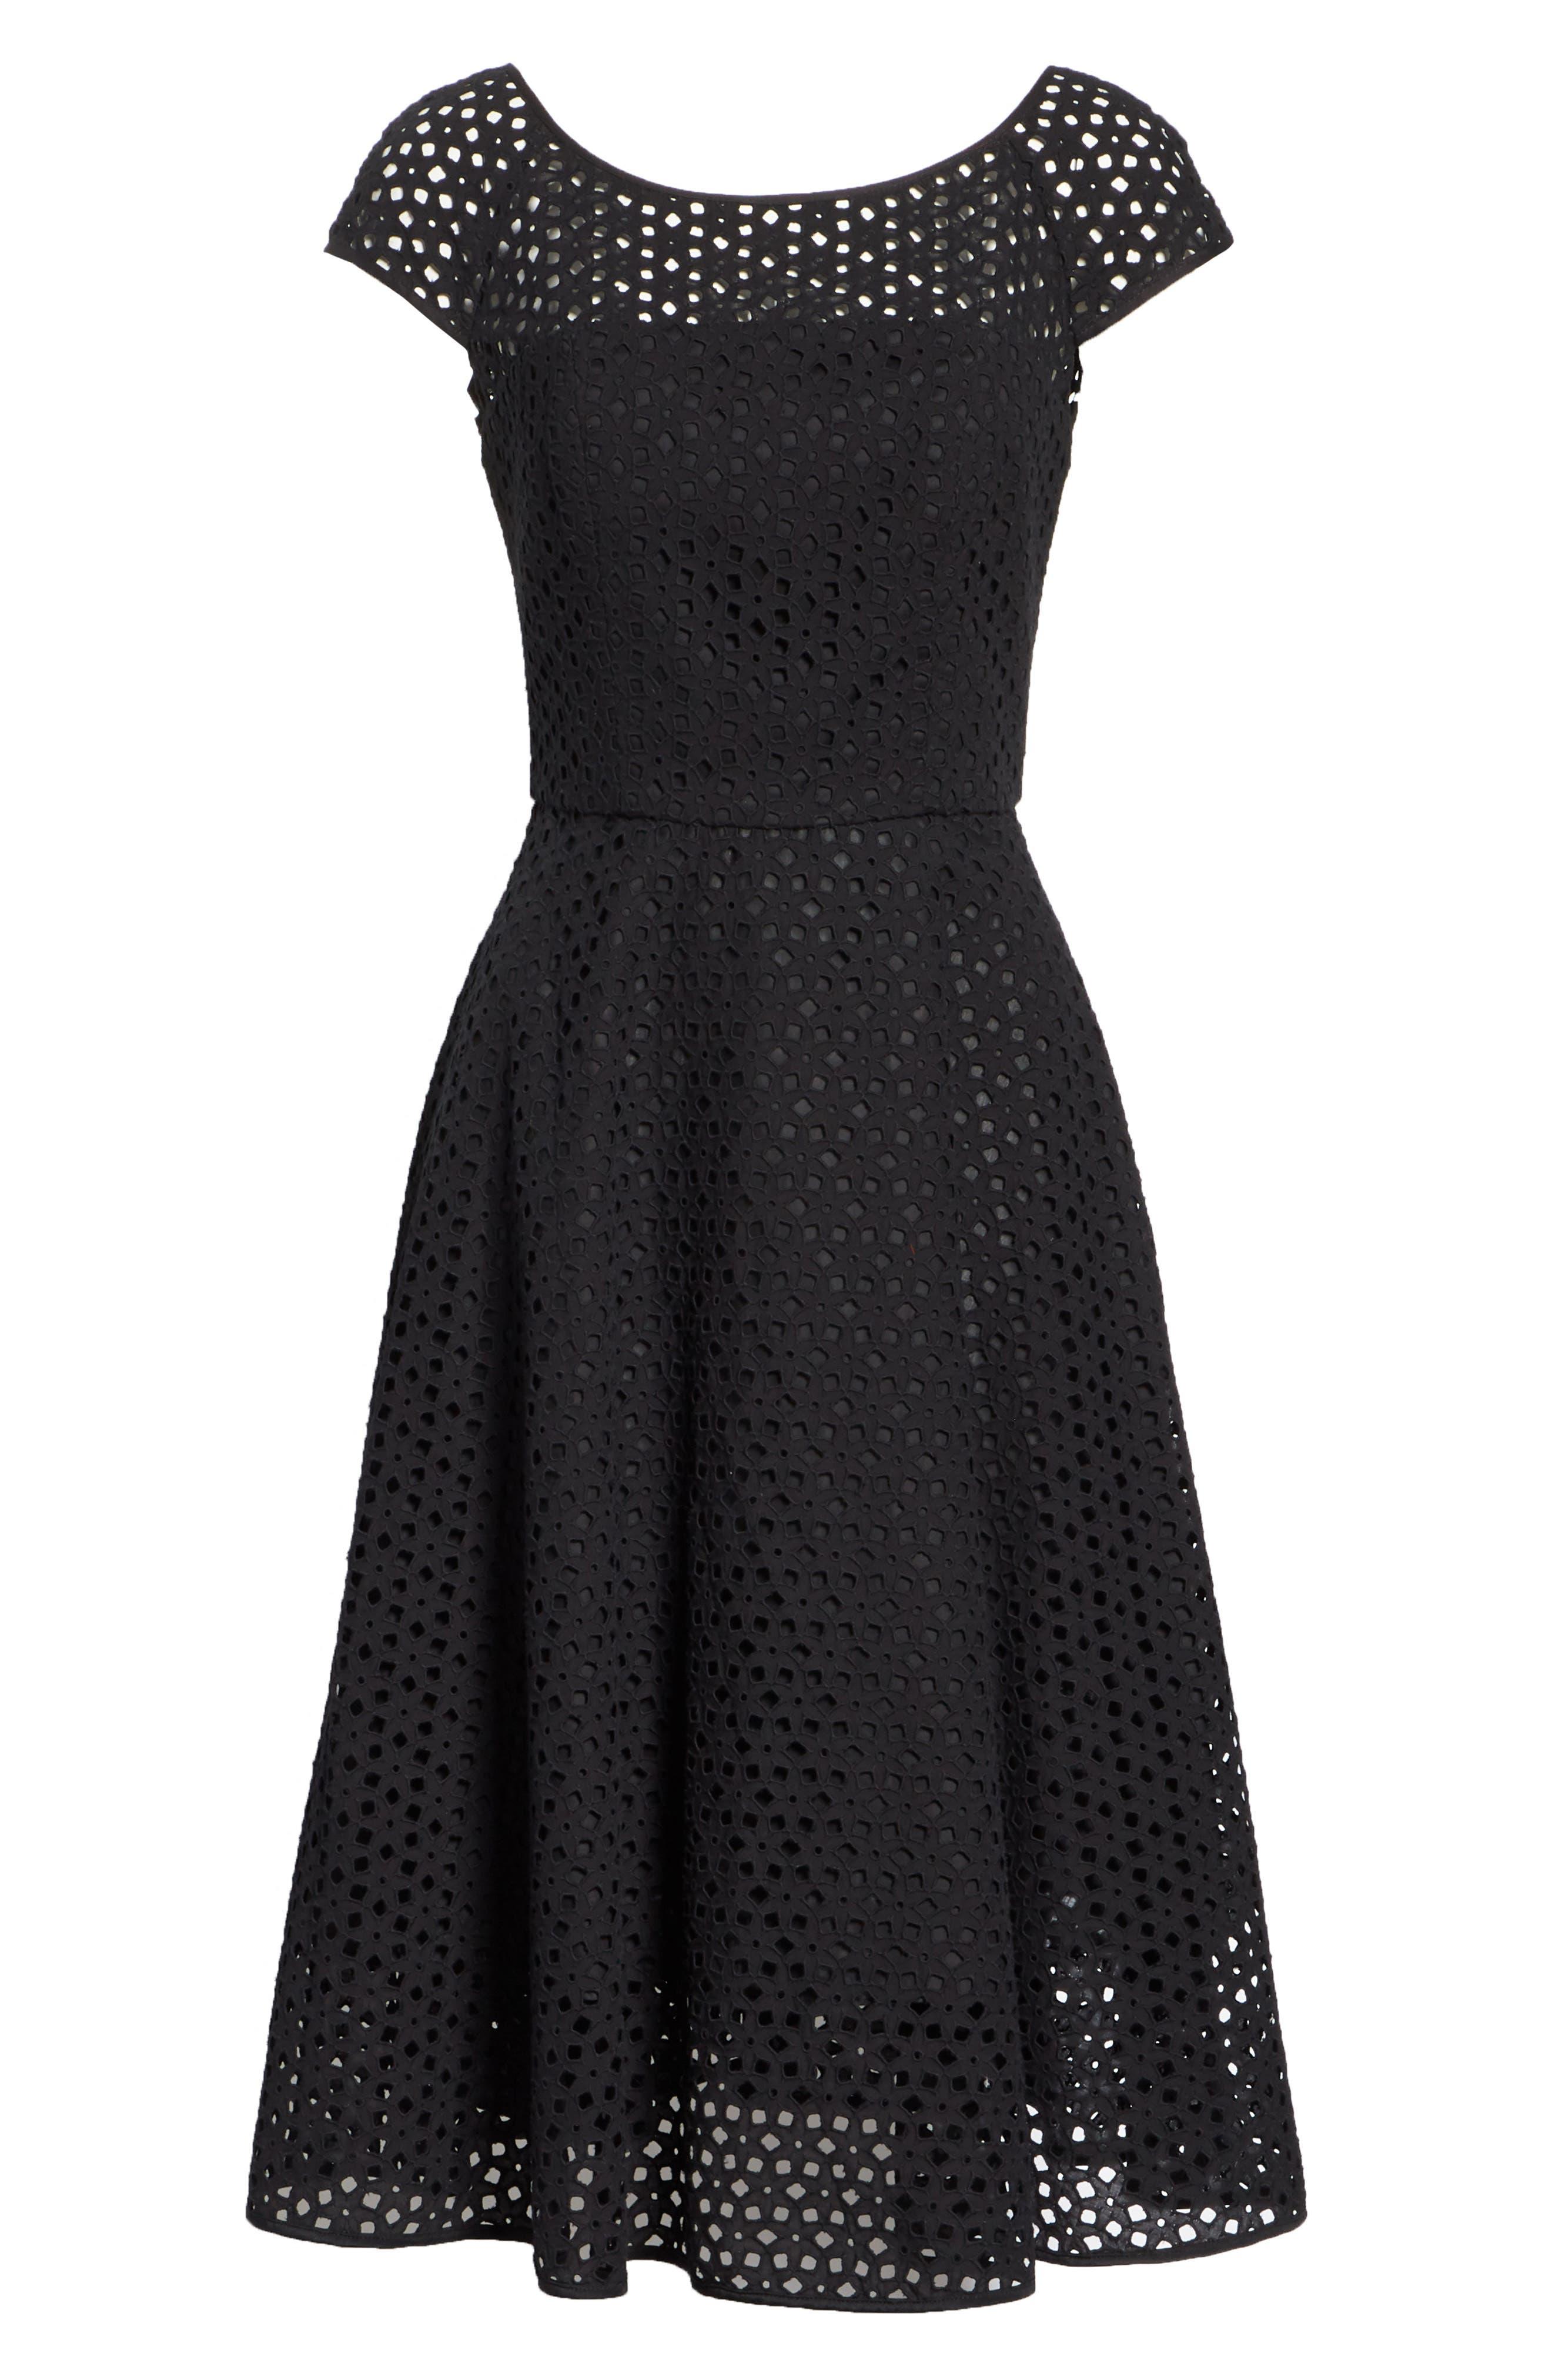 Cathy Cotton Eyelet Dress,                             Alternate thumbnail 6, color,                             Black